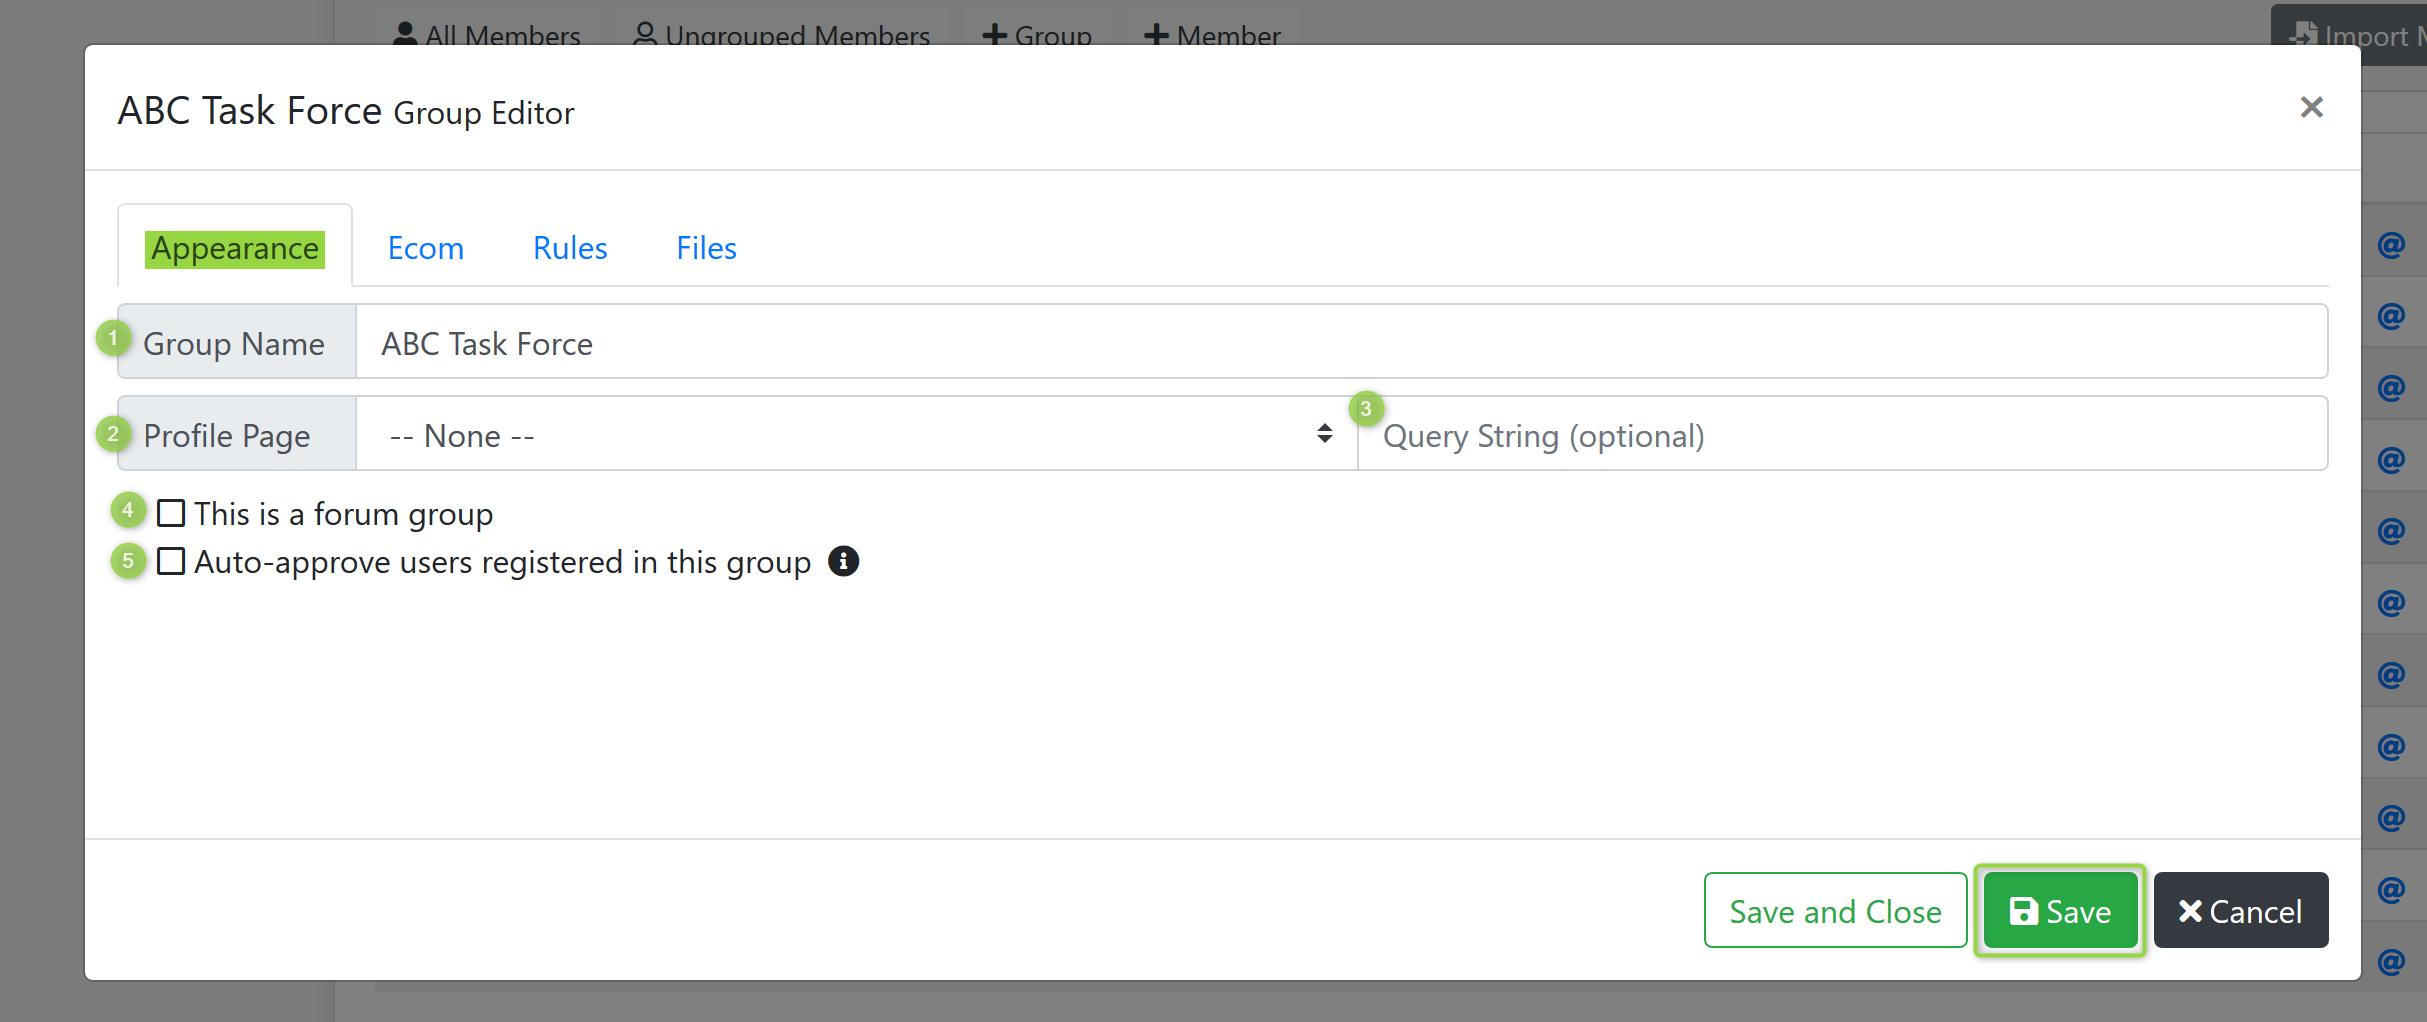 Group Editor Screenshot